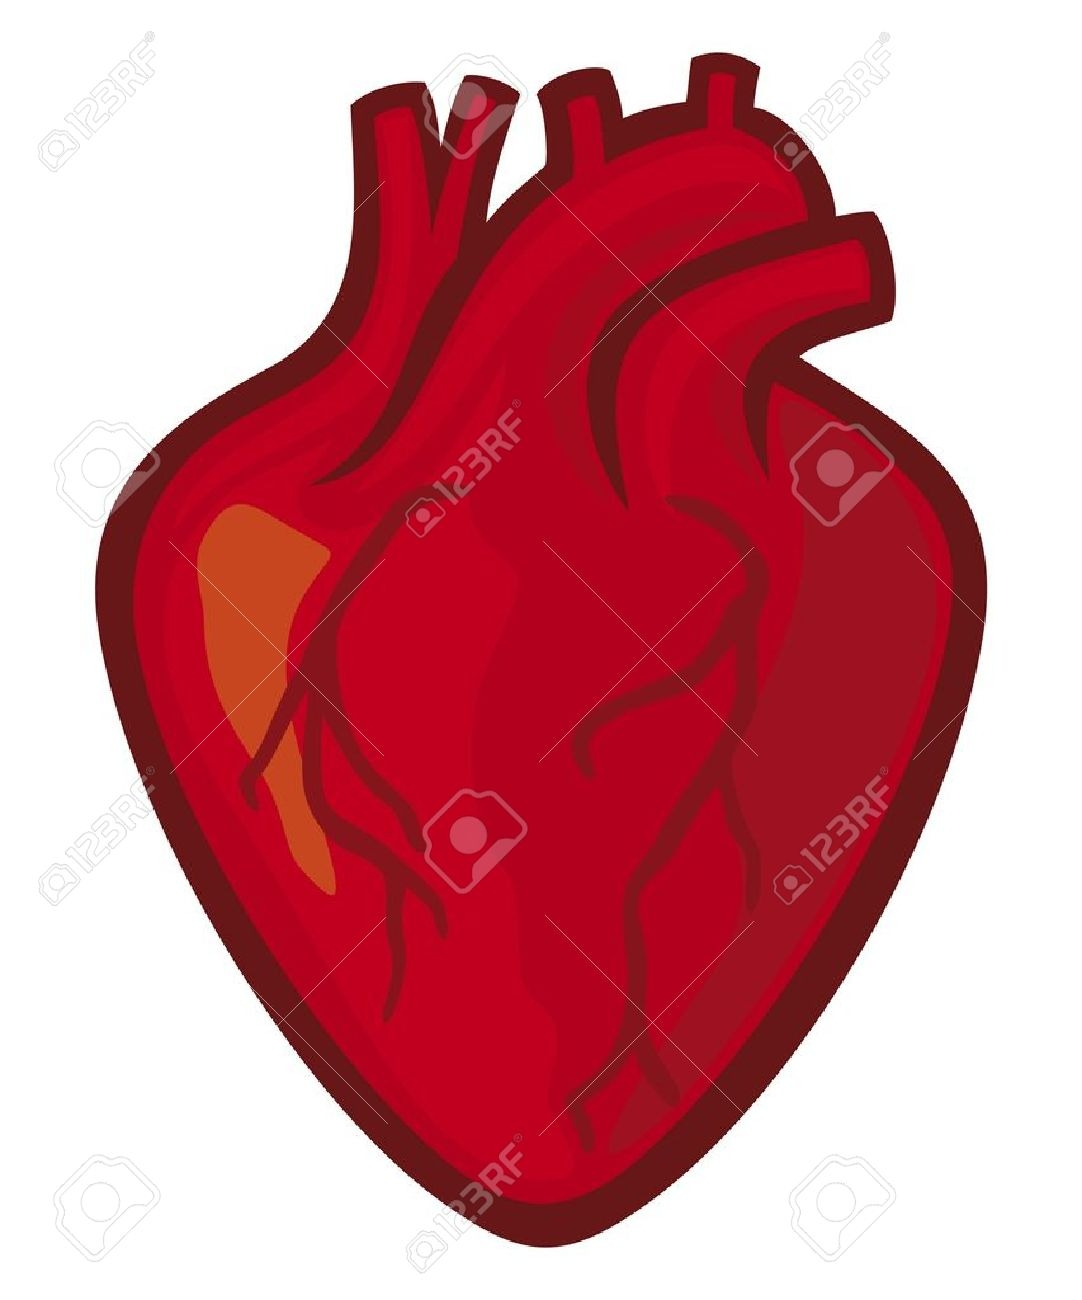 Human heart cliparts library Human Heart Clipart | Free download best Human Heart Clipart on ... library